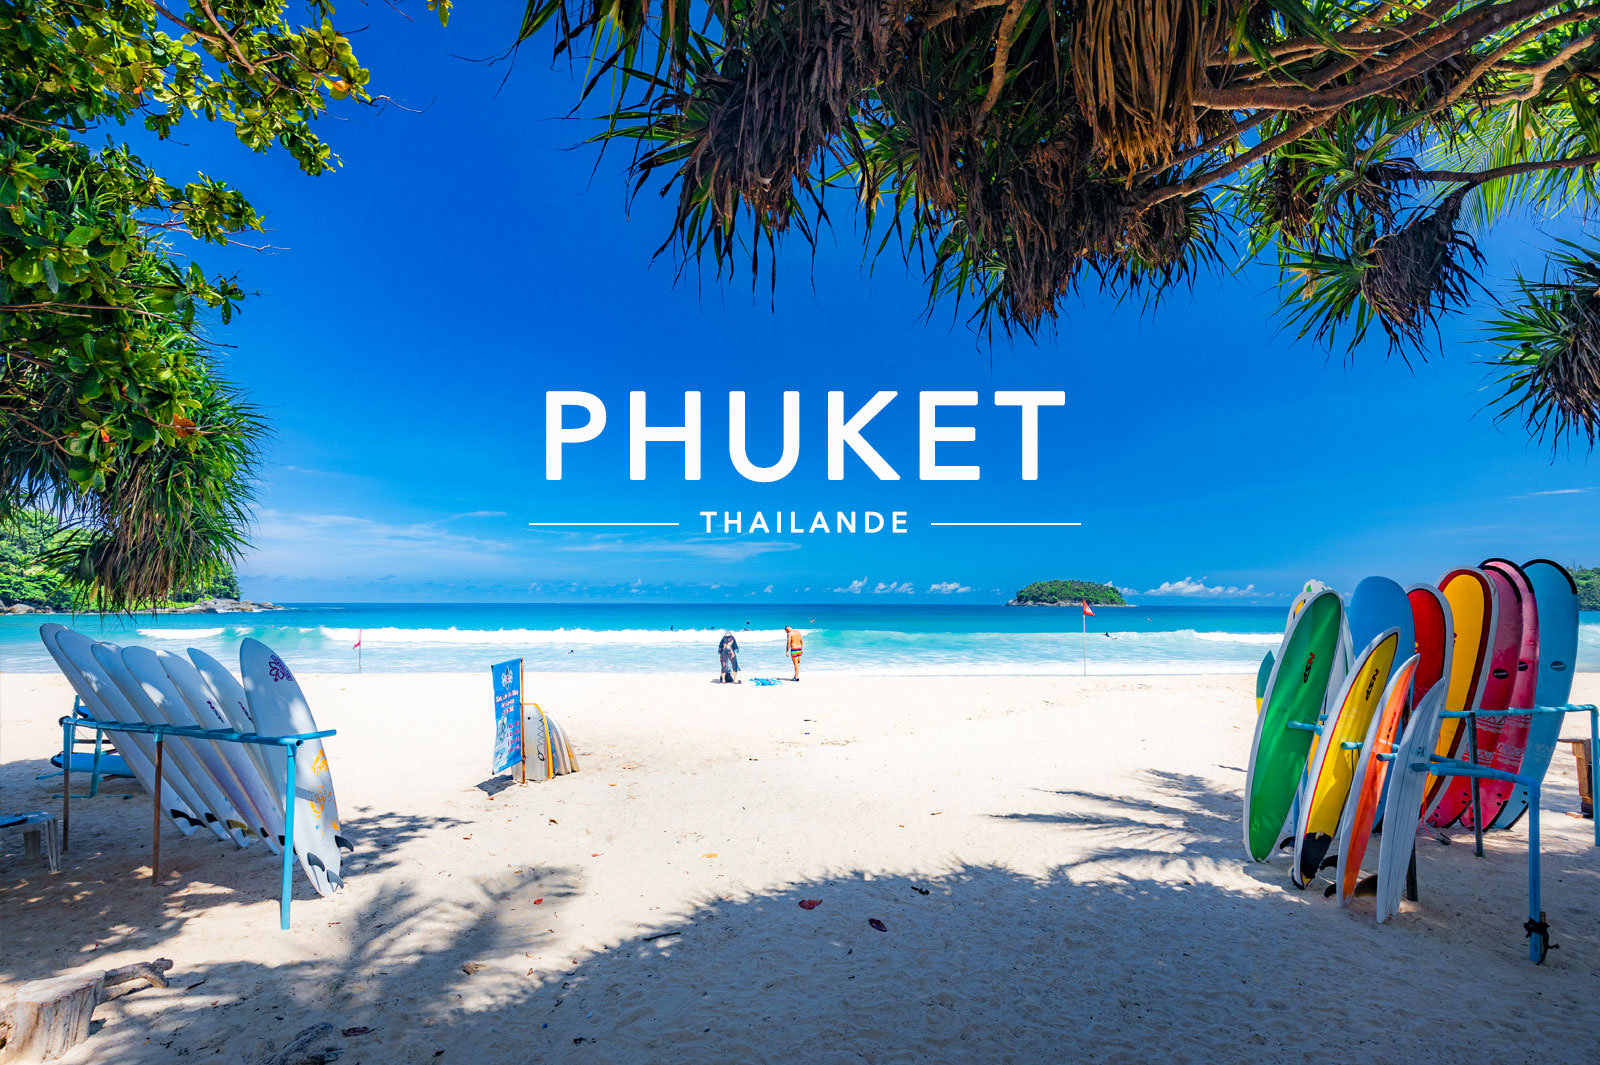 Phuket, Thailande